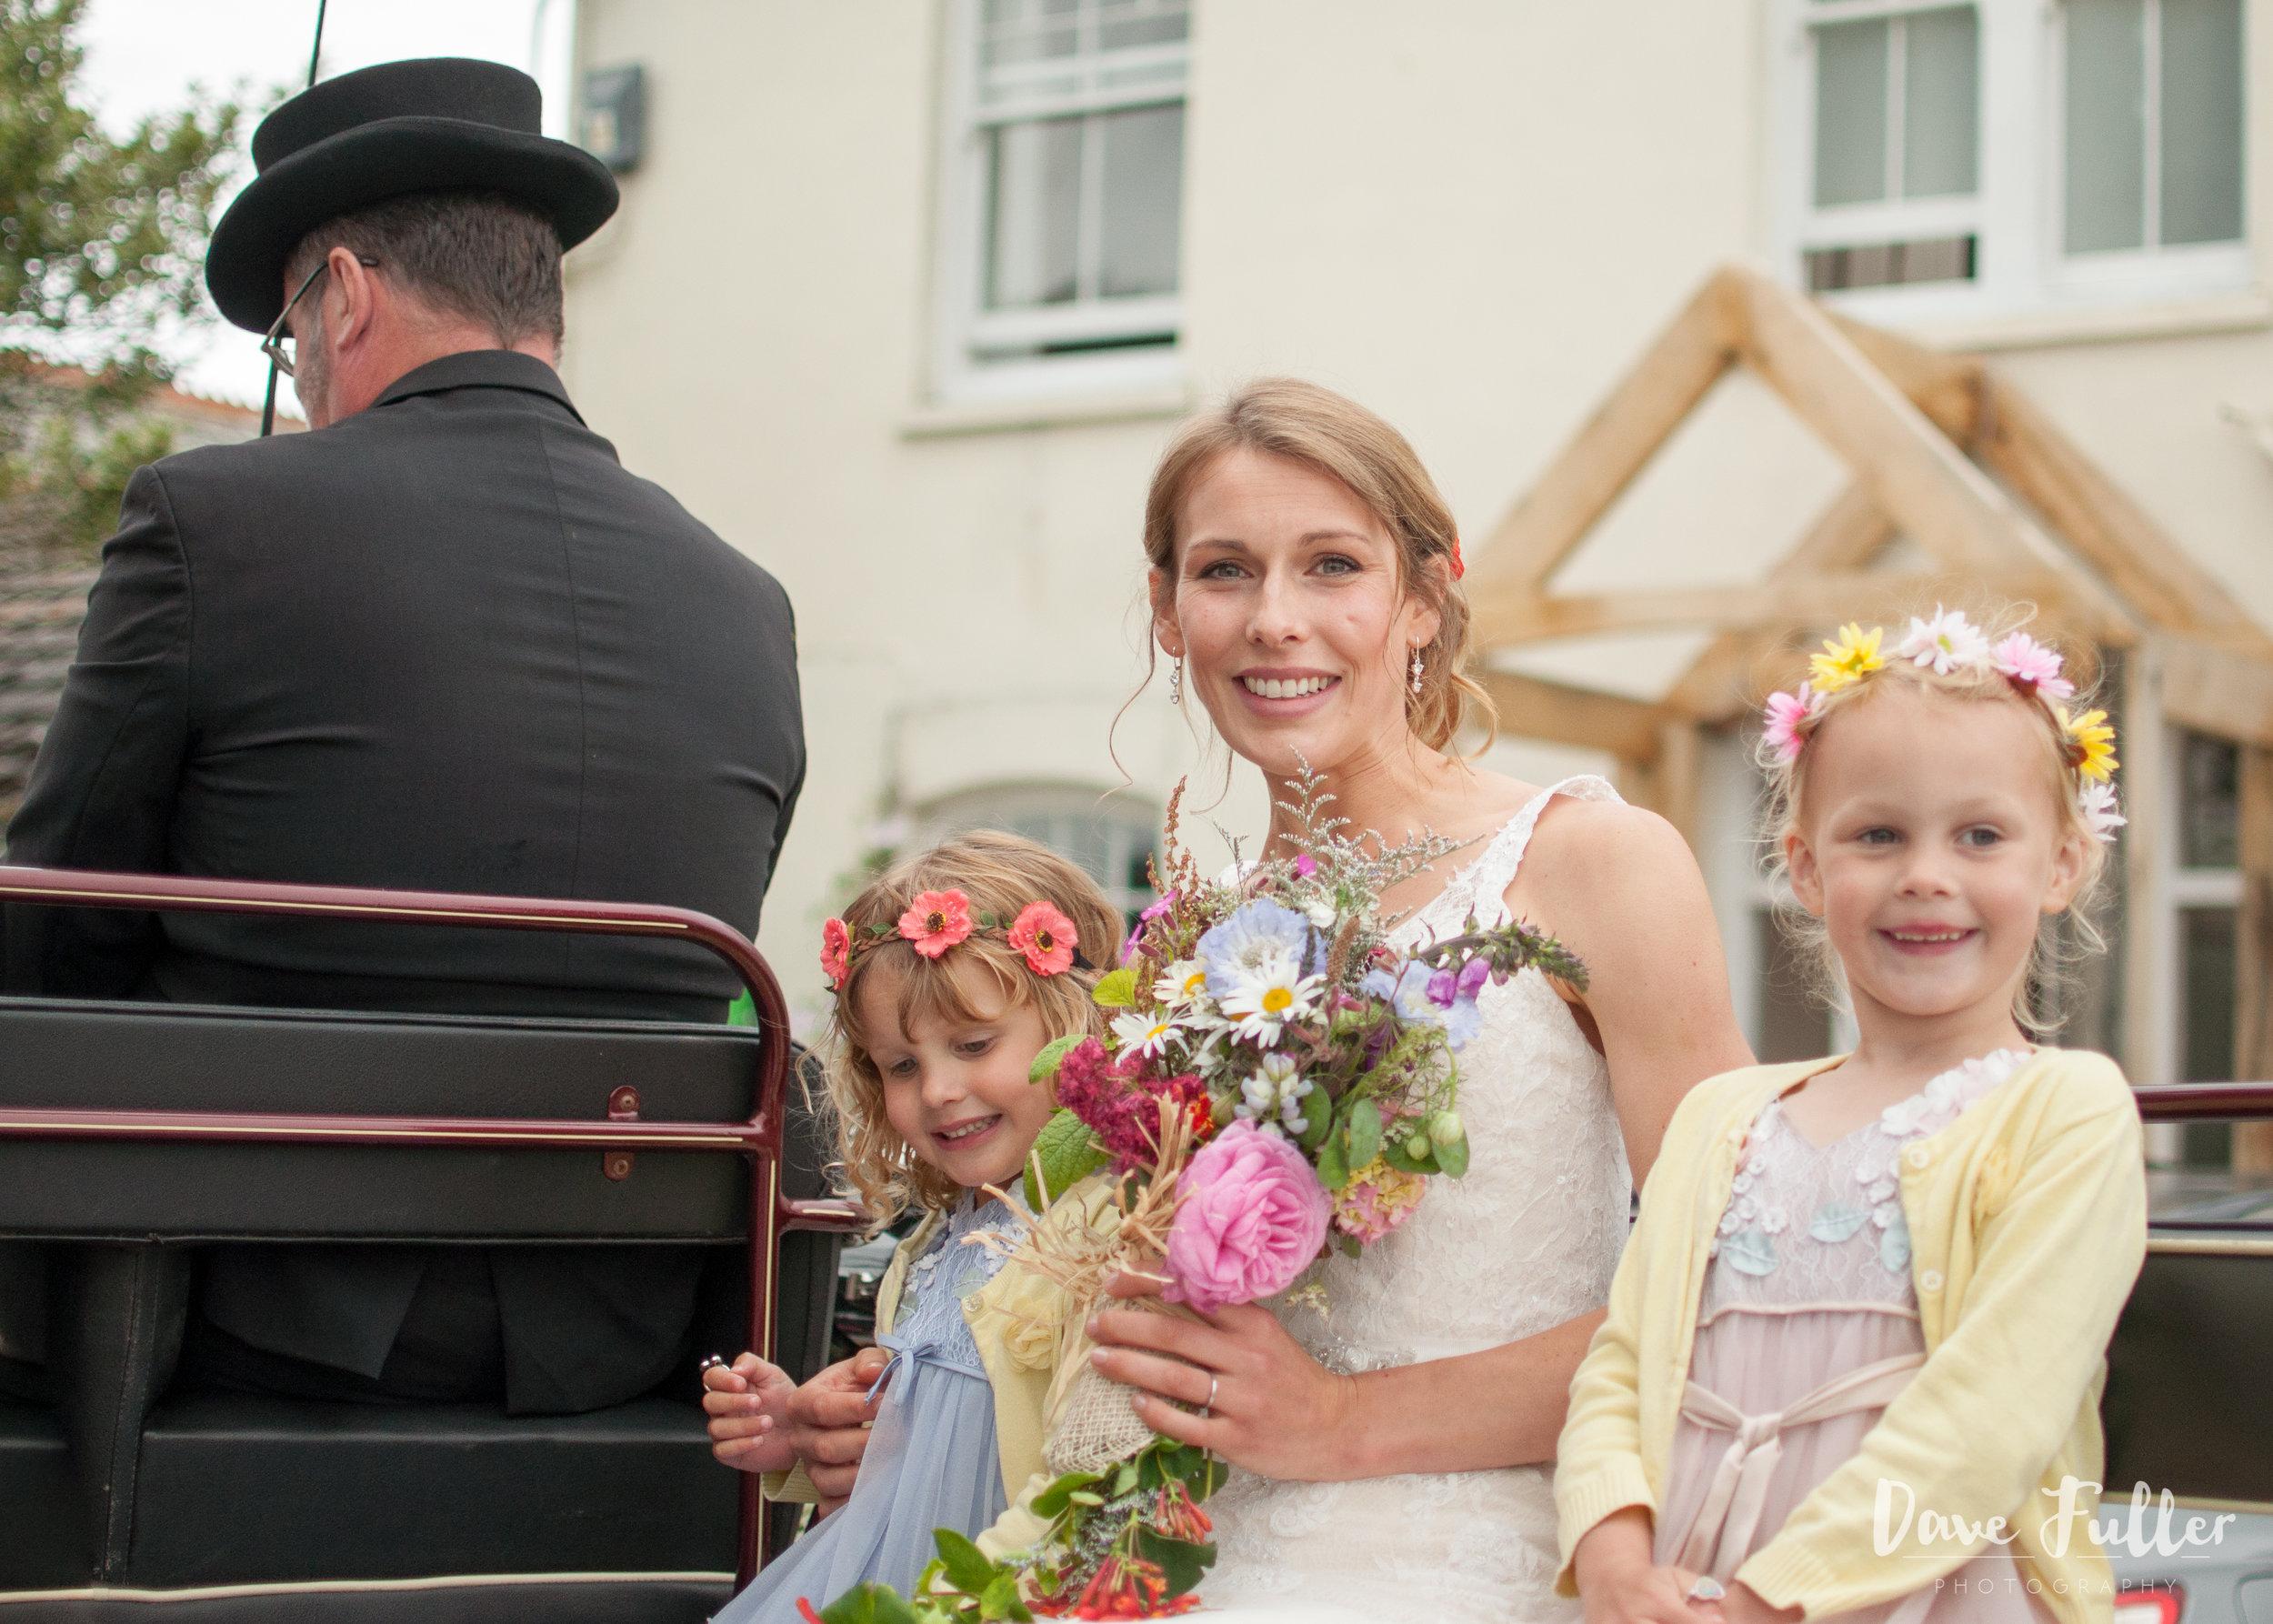 Nottingham Wedding Photographer - ward-0183.jpg